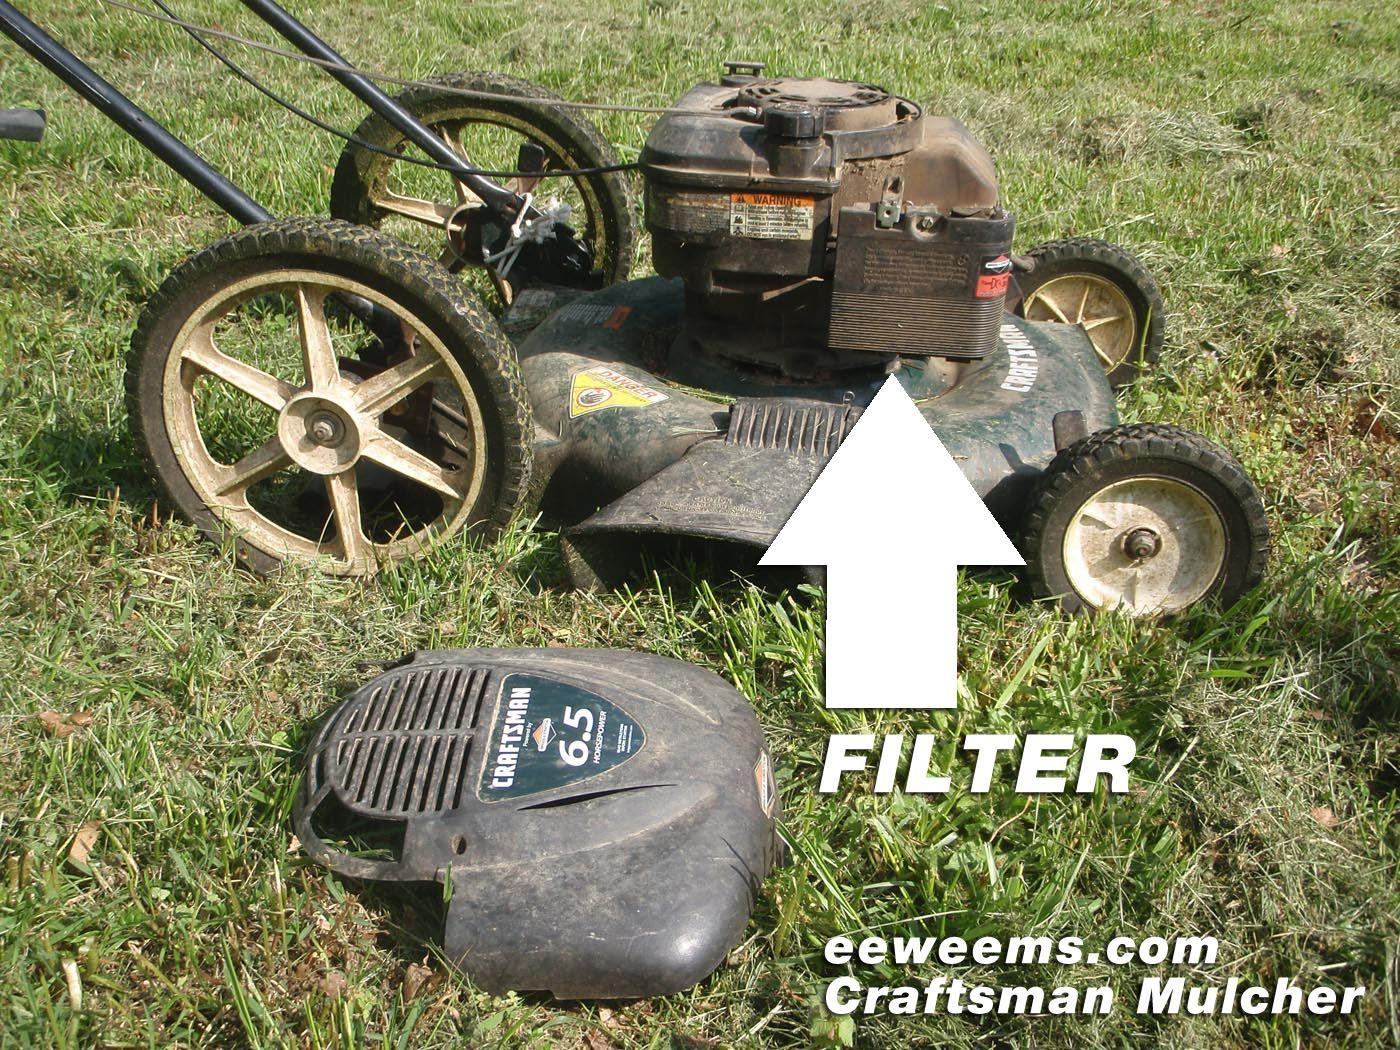 Craftsman 917 Mower Mulcher 22 Air Filter Mower Craftsman Lawn Mowers